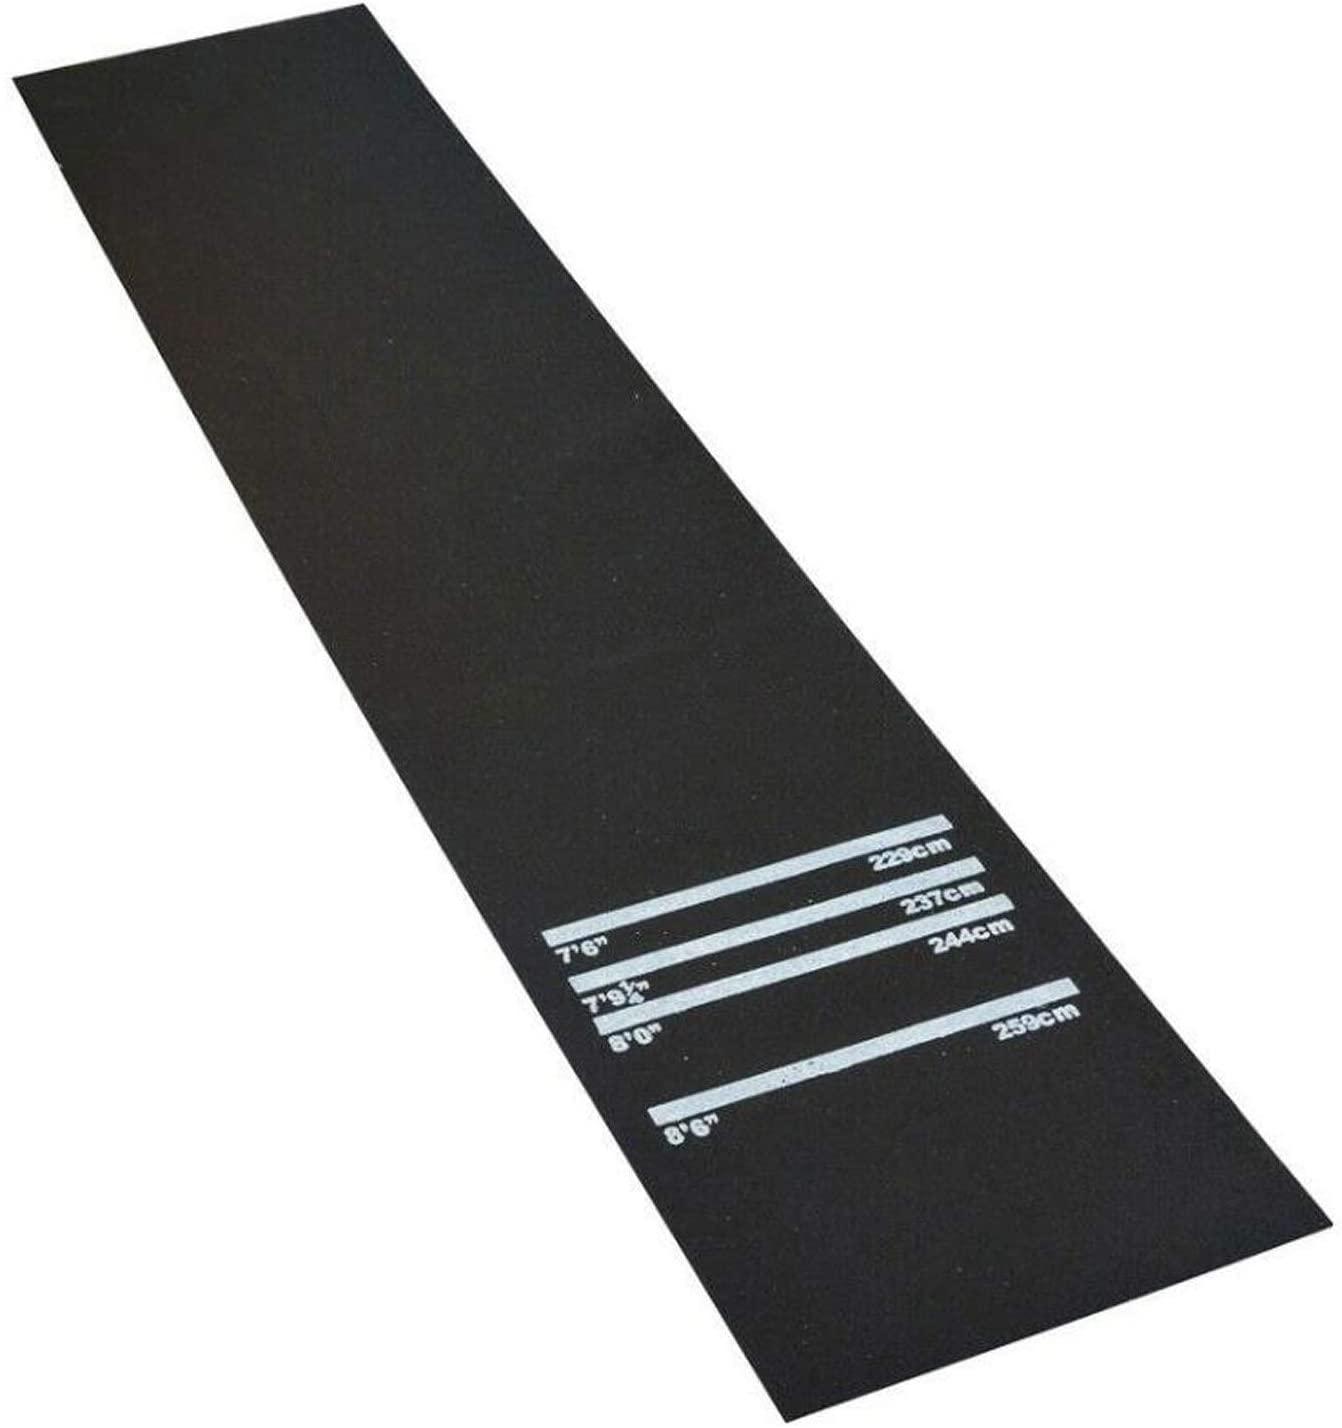 Lehom Dart Mat Throw/Toe Line Floor Marker Professional Rubber Darts Mat for Home Pub Party,118 x 24 x 1/5inch Black